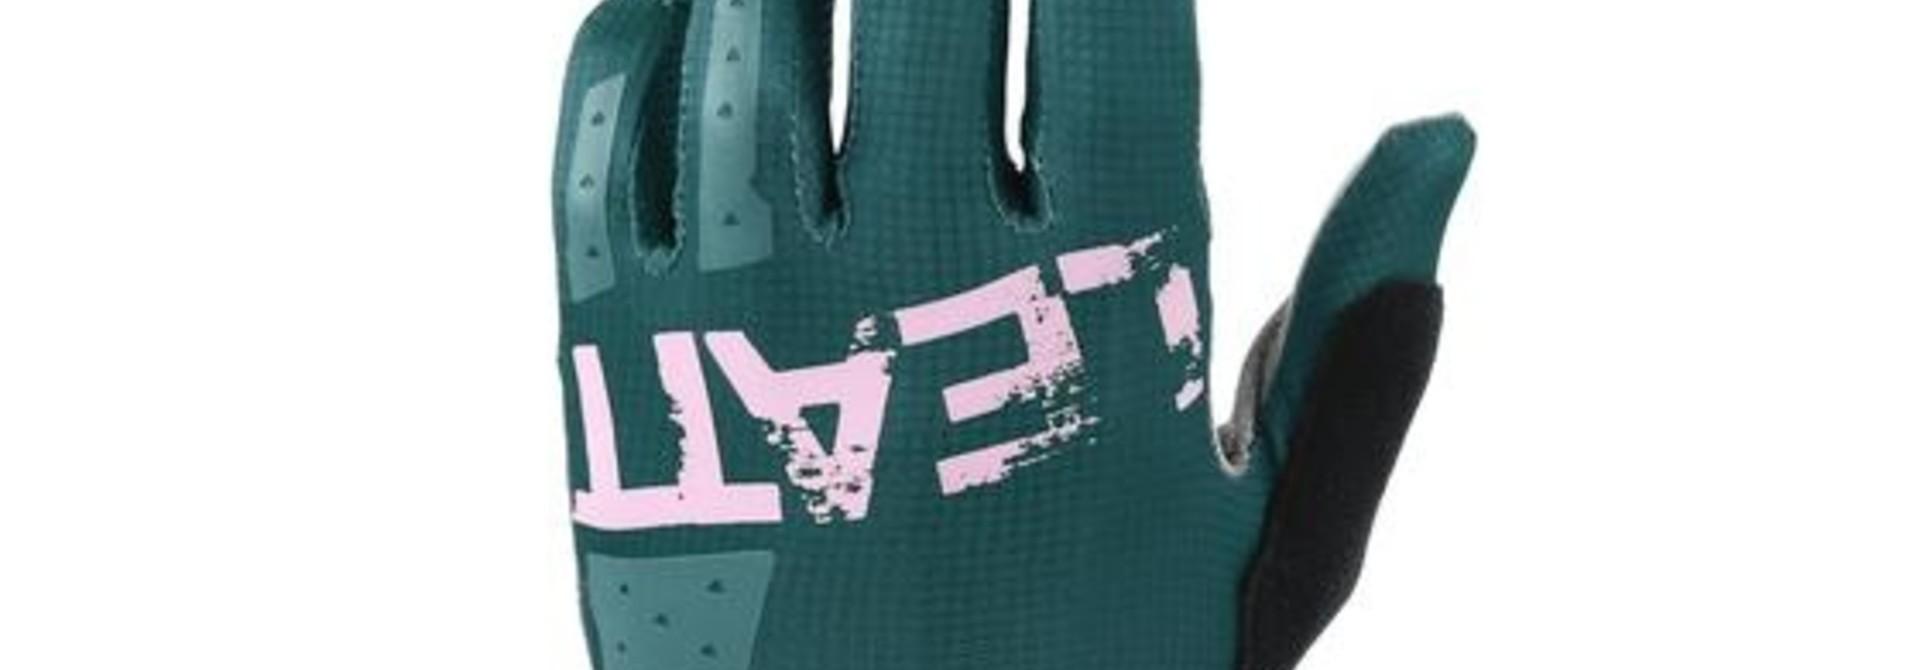 Leatt Protection Glove MTB 1.0 Women's